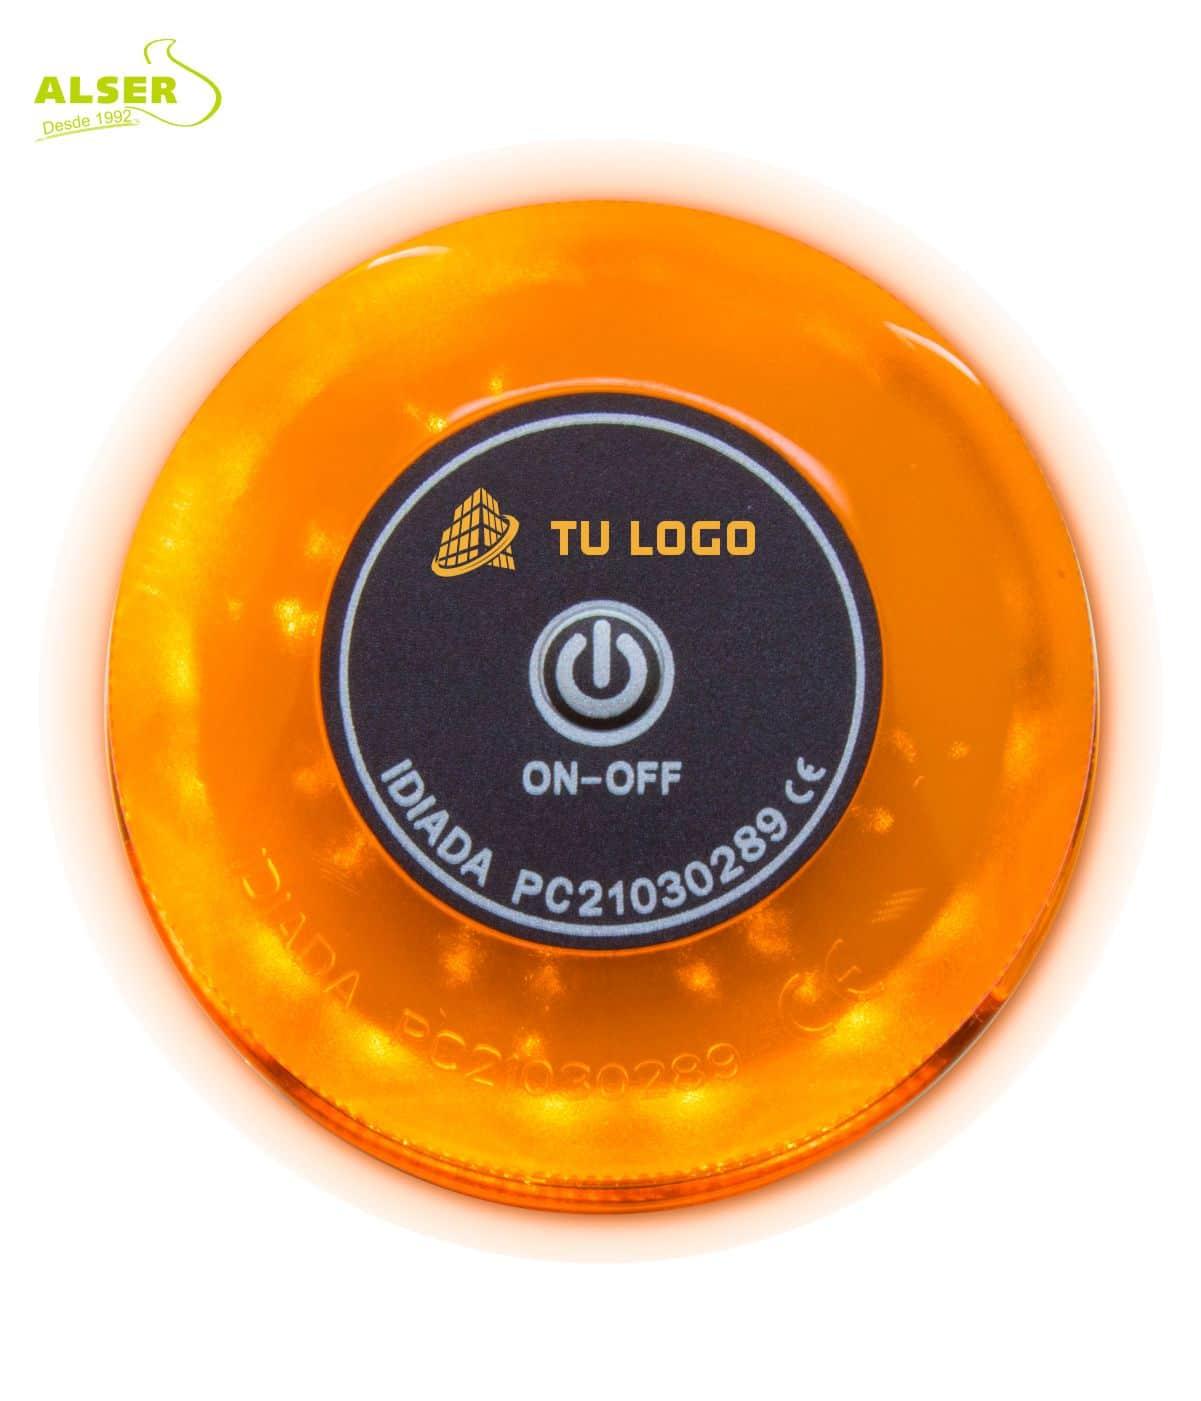 Luz de emergencia Baliza V16 con logotipo